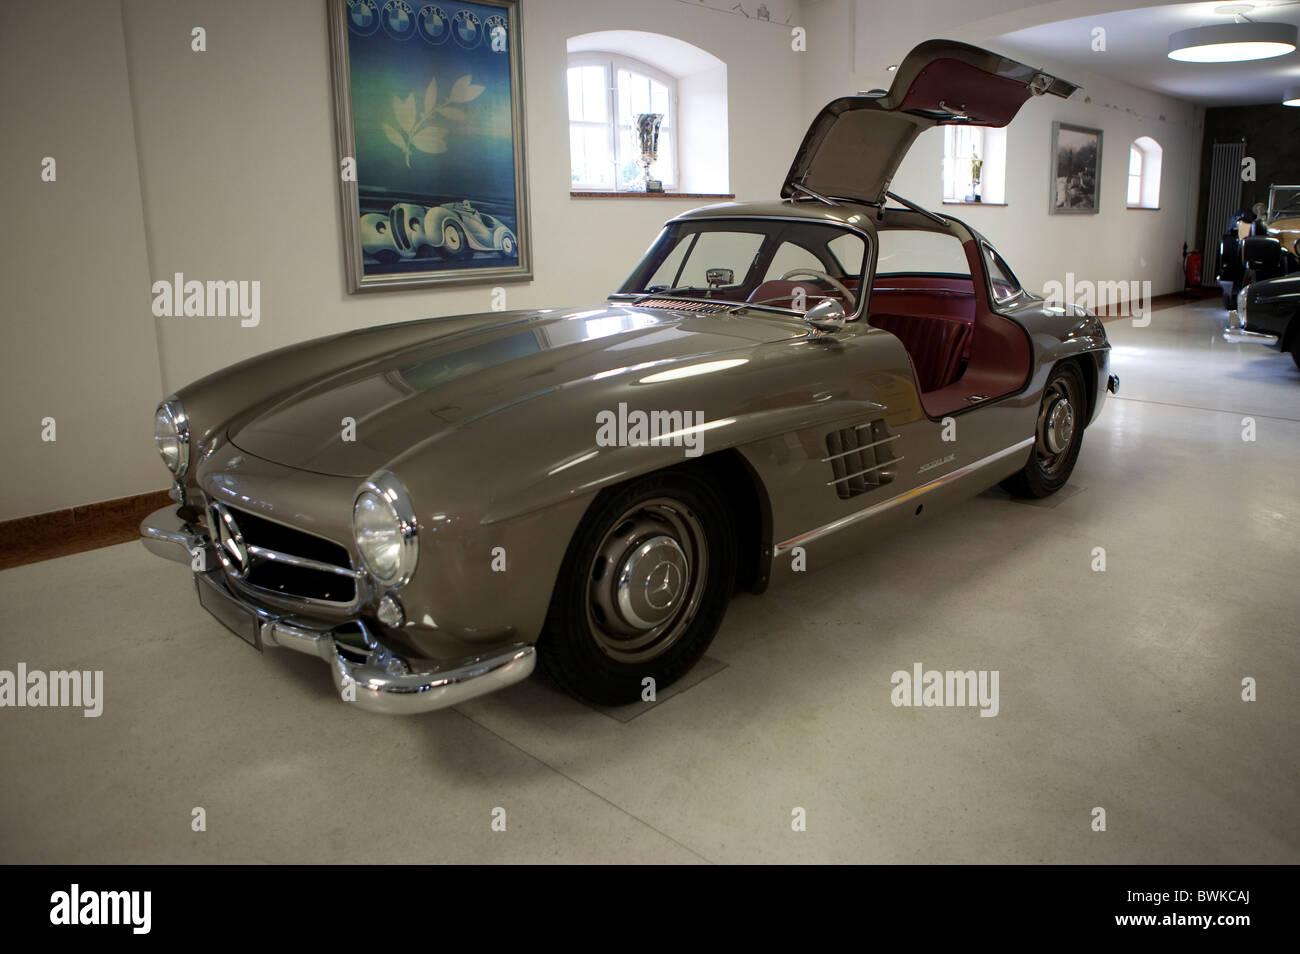 Vintage Mercedes 300 SL Gullwing